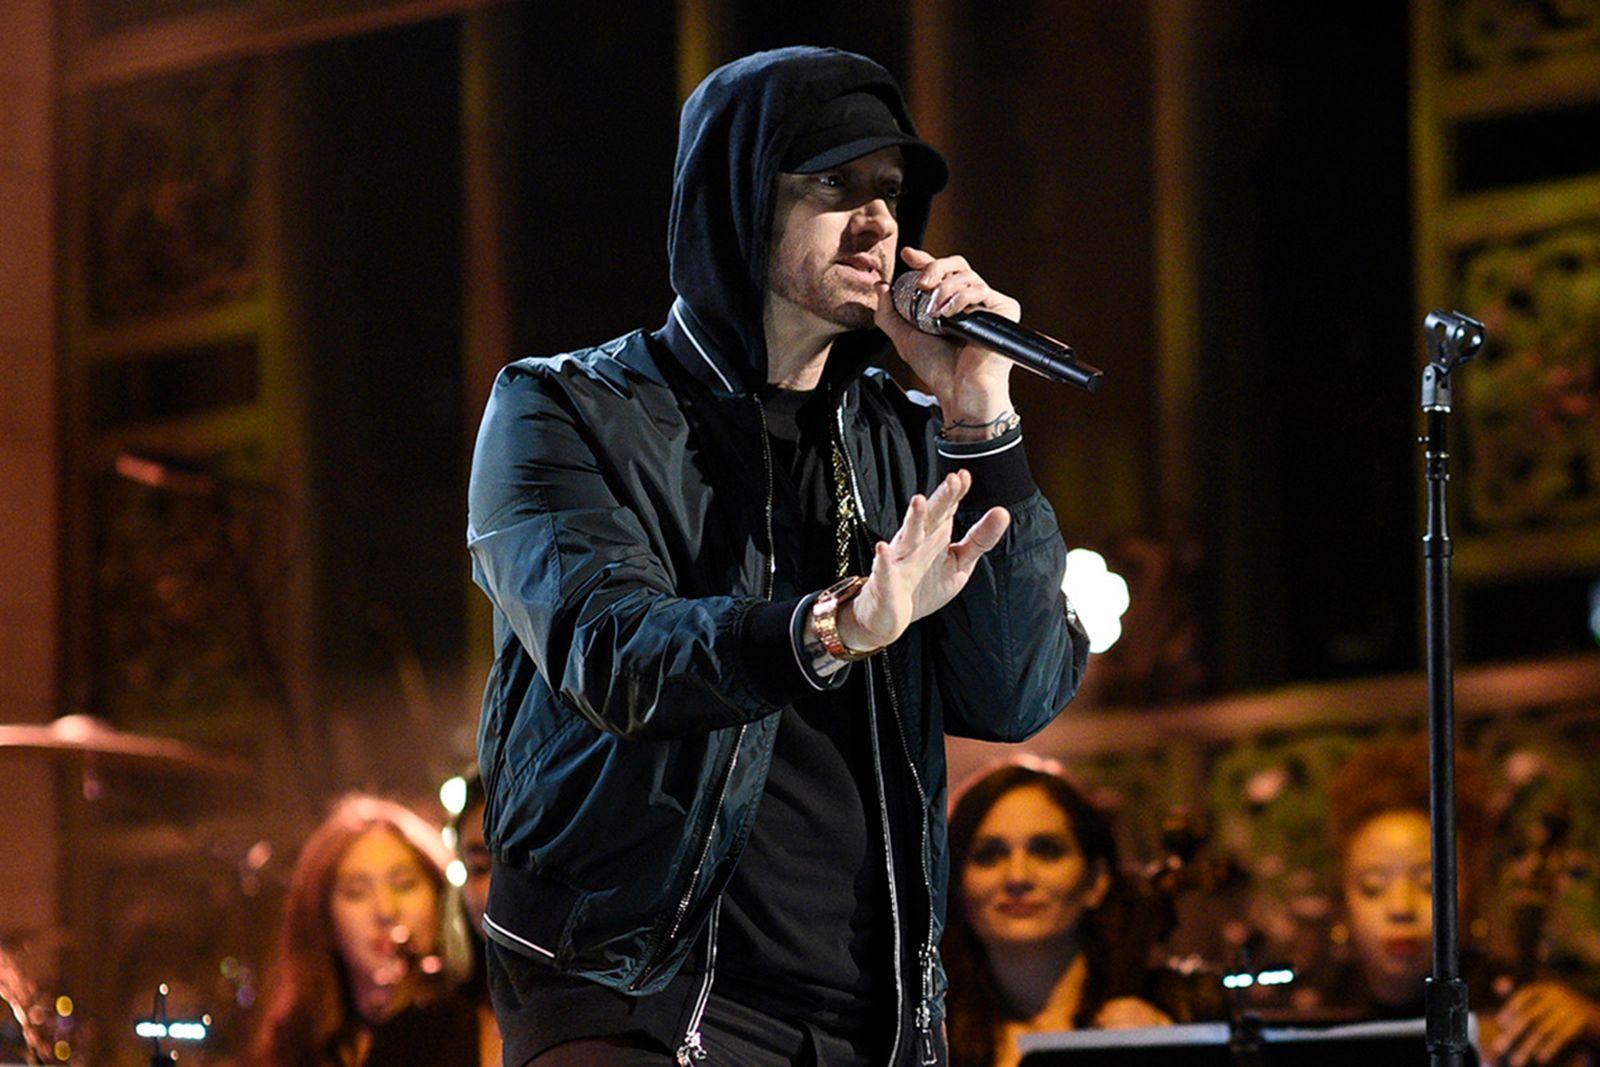 Eminem performs a Medley in Studio 8H